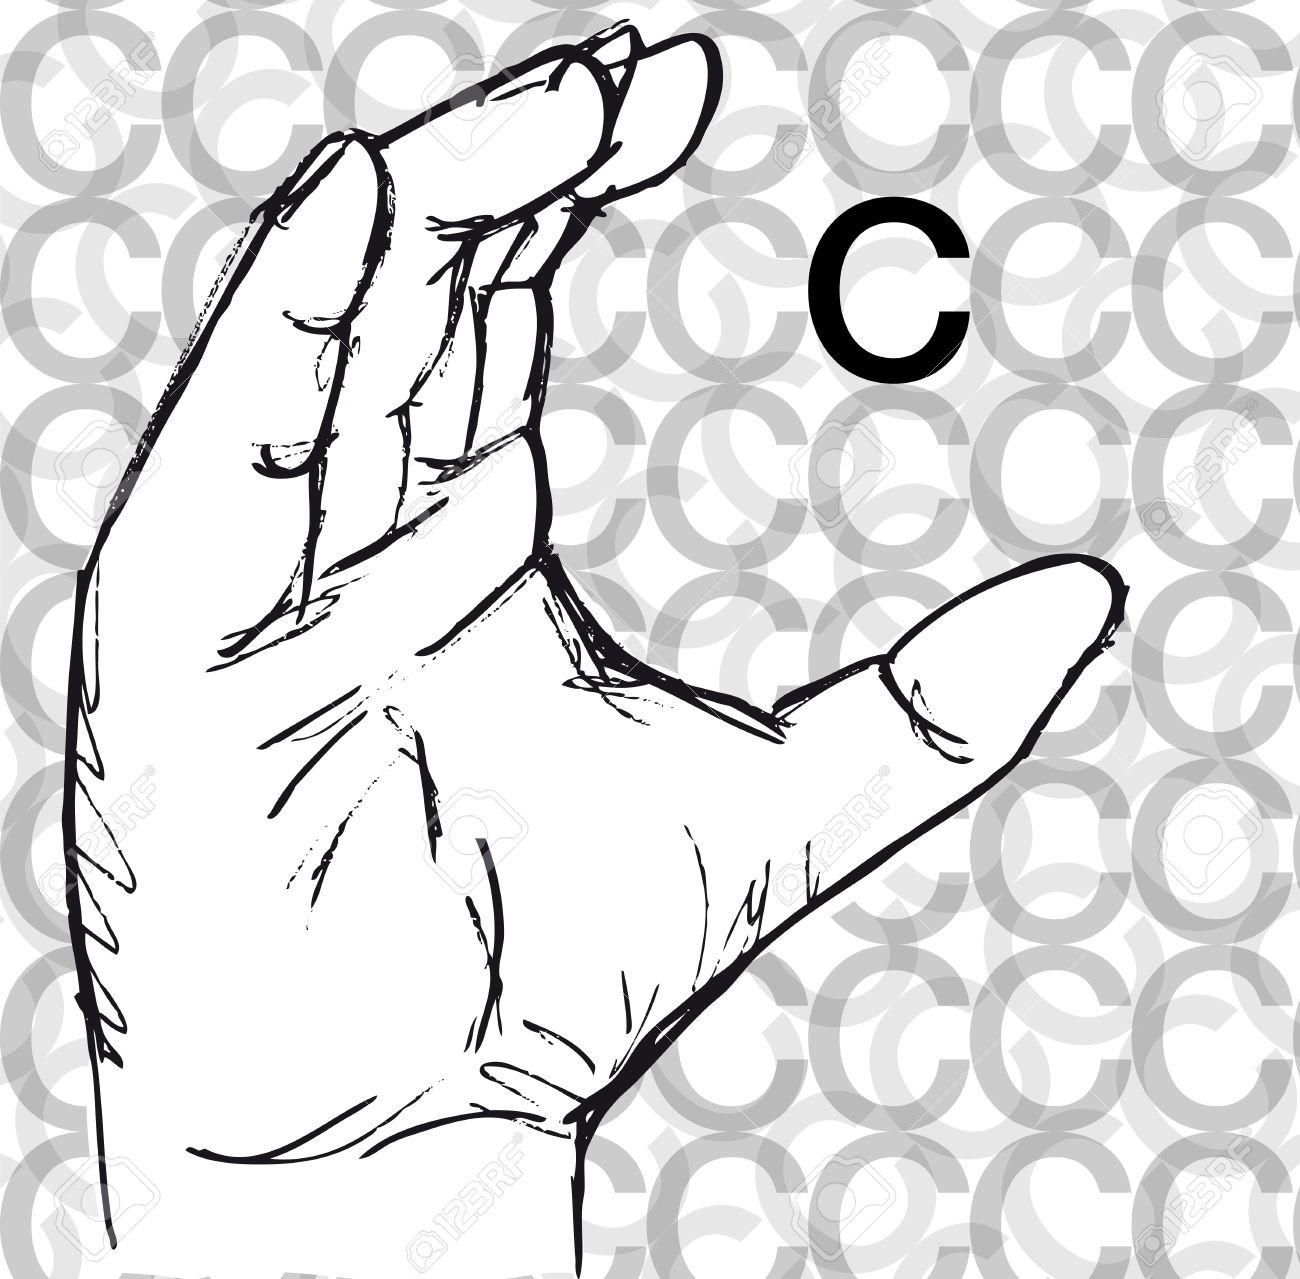 Sketch of Sign Language Hand Gestures, Letter c. Vector illustration Stock Vector - 12288527